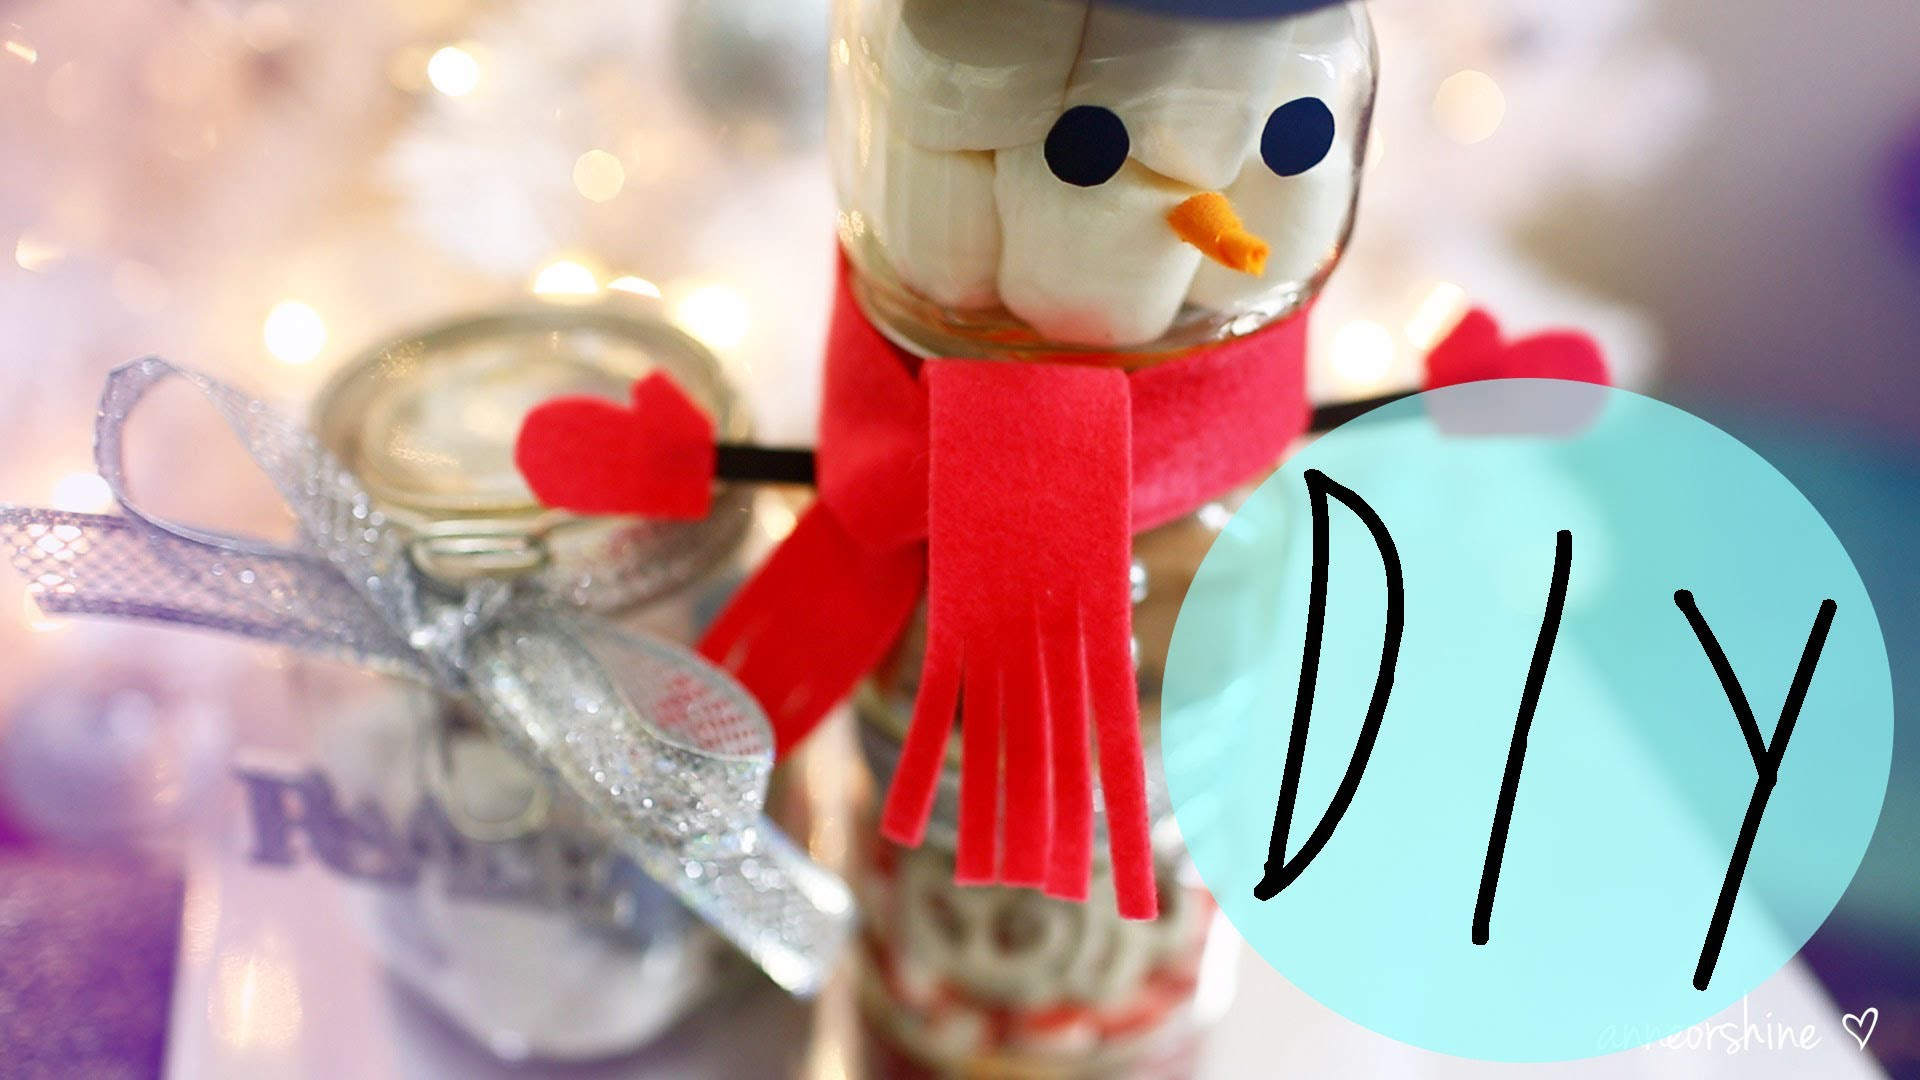 DIY Cute Holiday Gift Ideas Using Jars | ANNEORSHINE